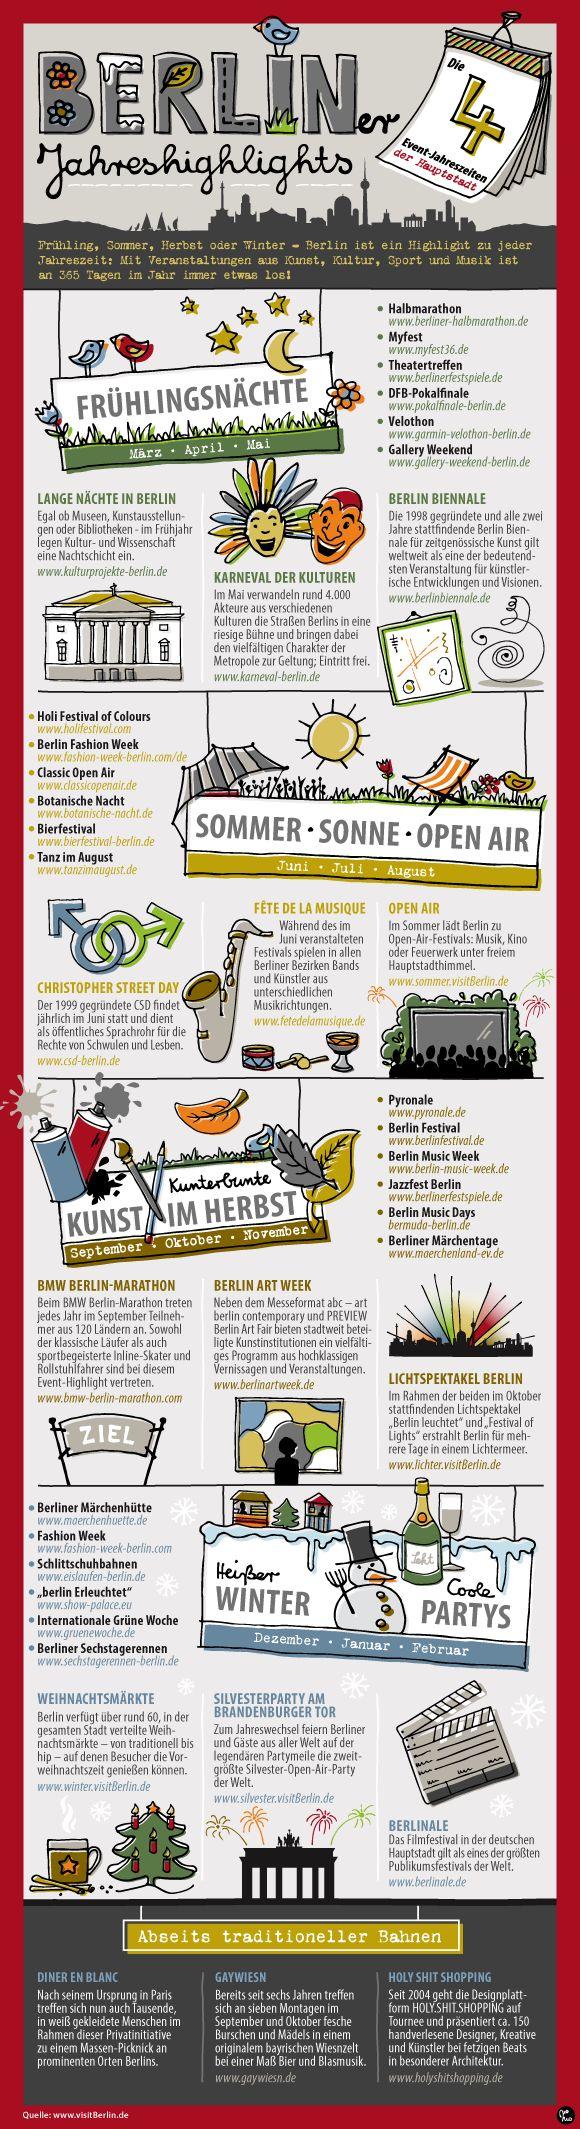 Berliner Jahreshighlights | Mo Büdinger